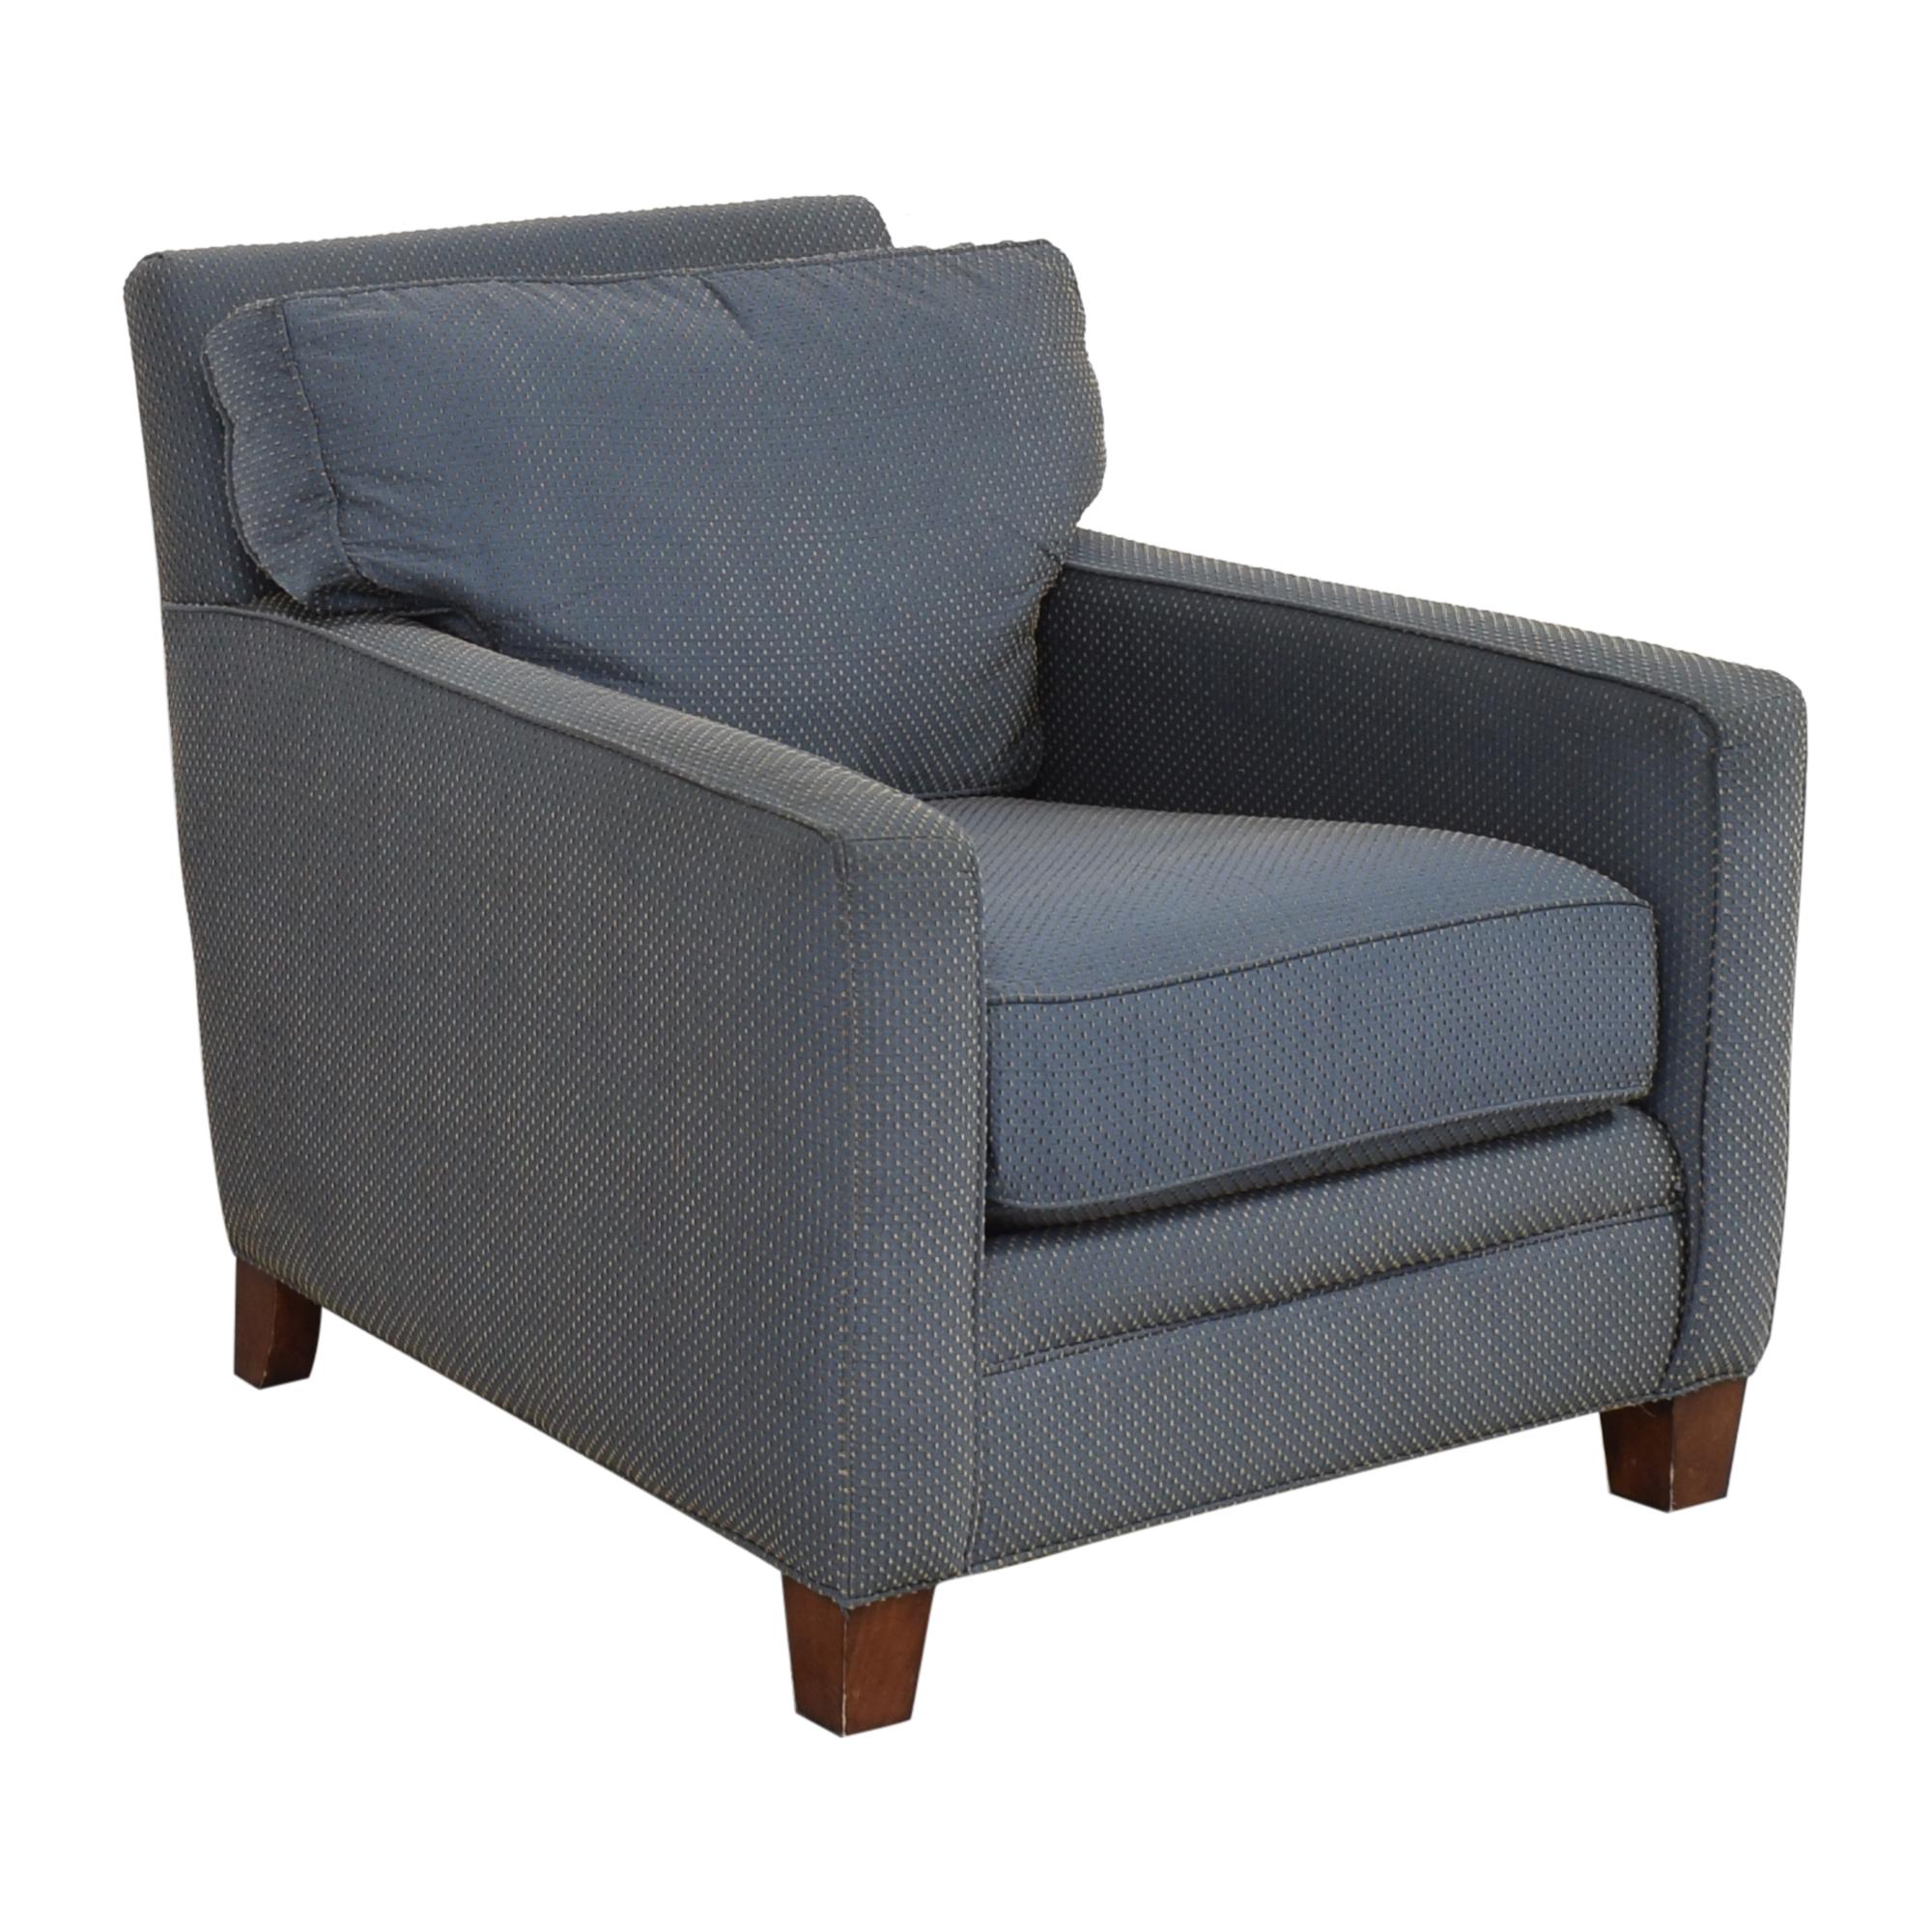 Thomasville Thomasville Accent Chair blue